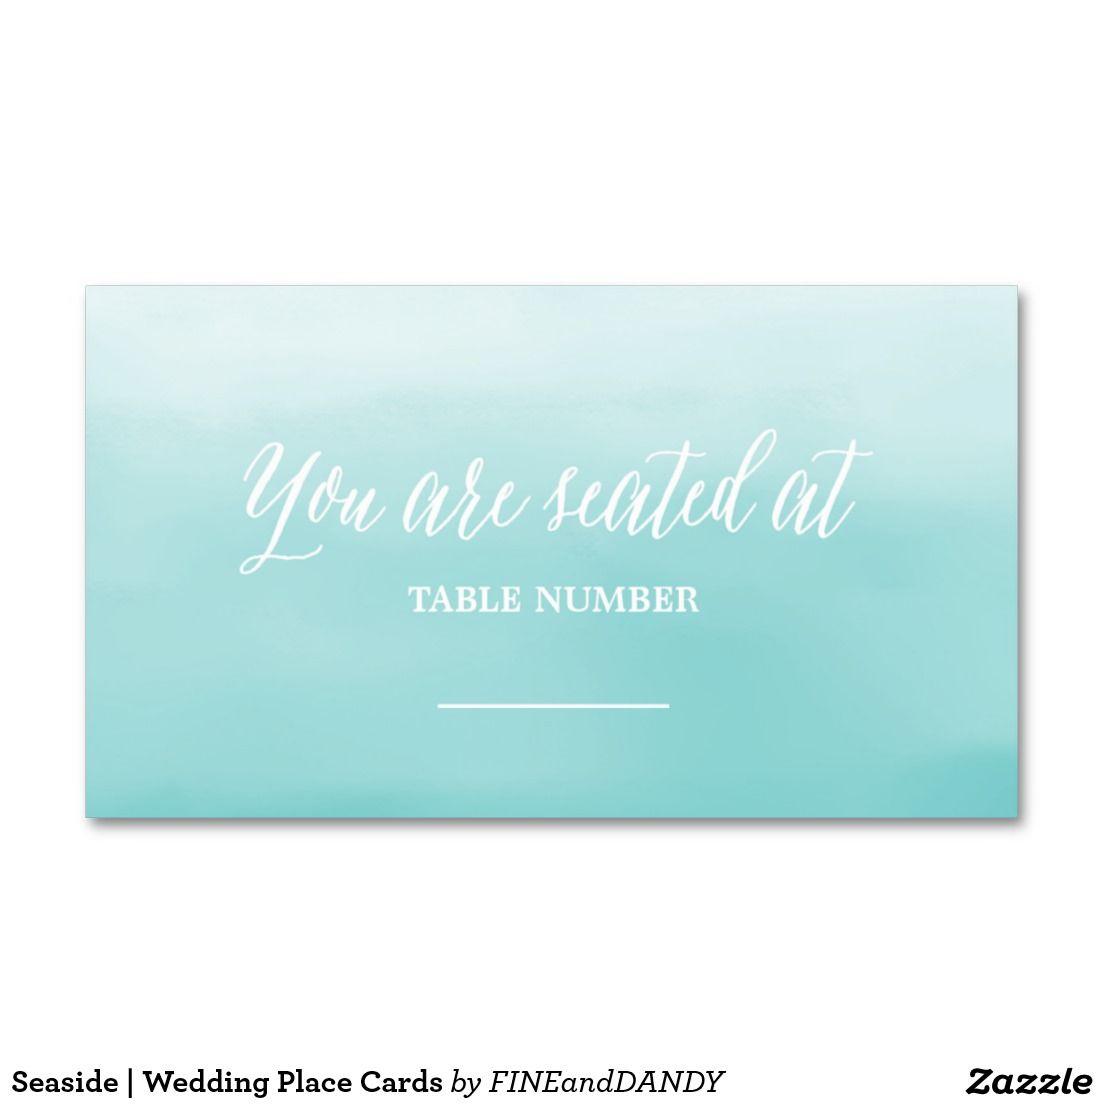 Seaside Wedding Place Cards Wedding Place Cards Seaside Wedding